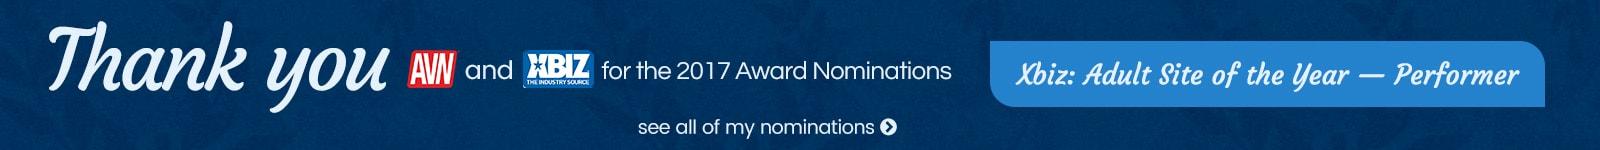 Jodi West Nominations Banner